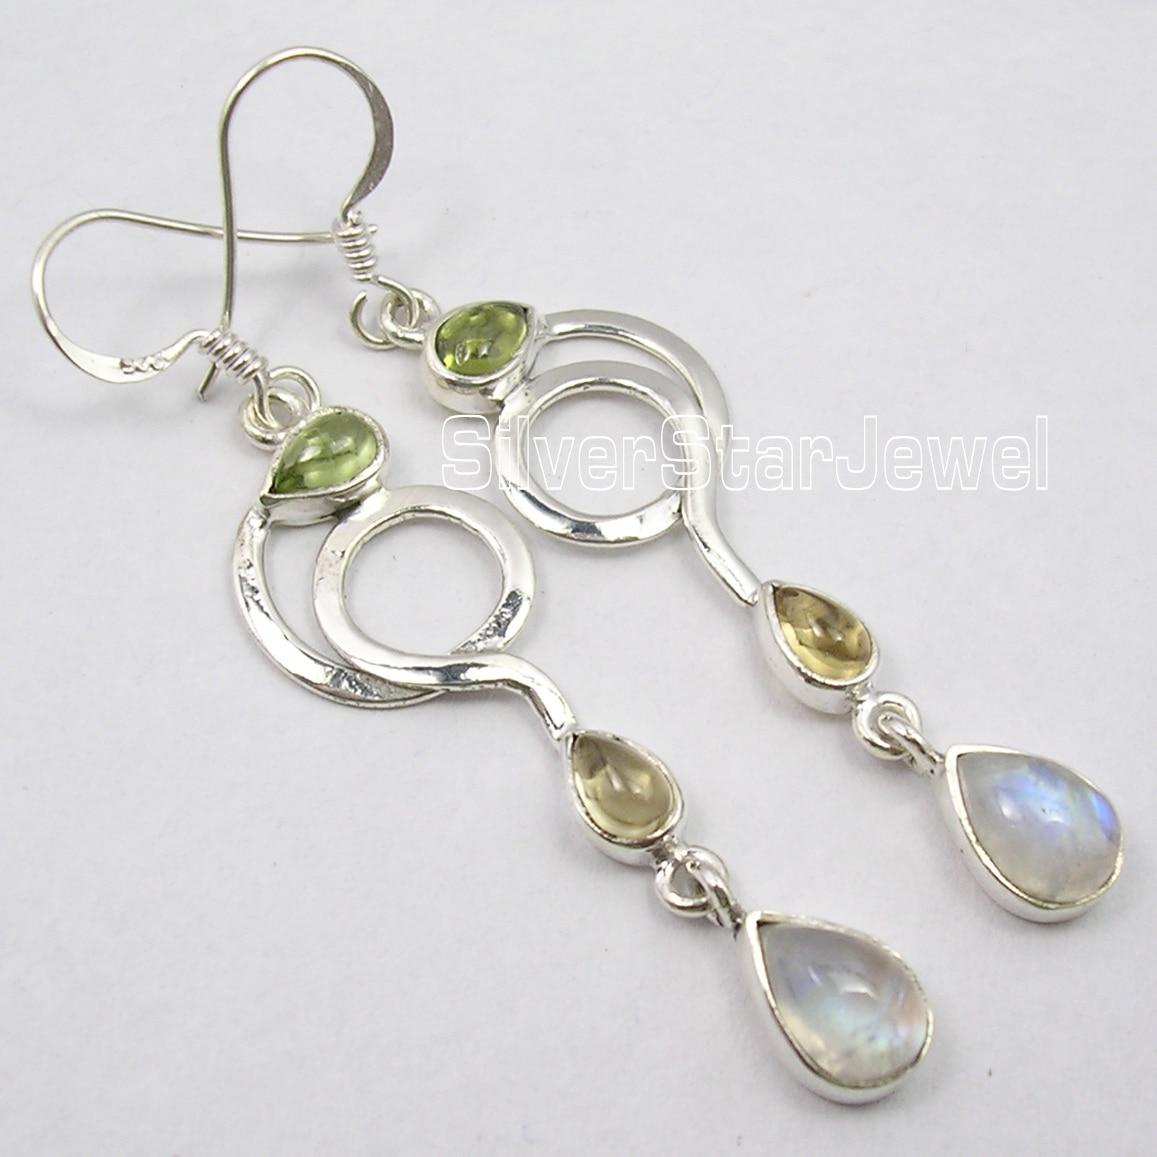 Chanti International Silver MULTICOLOR MULTI GemS LADIES Dangle LONG Earrings 6 CM